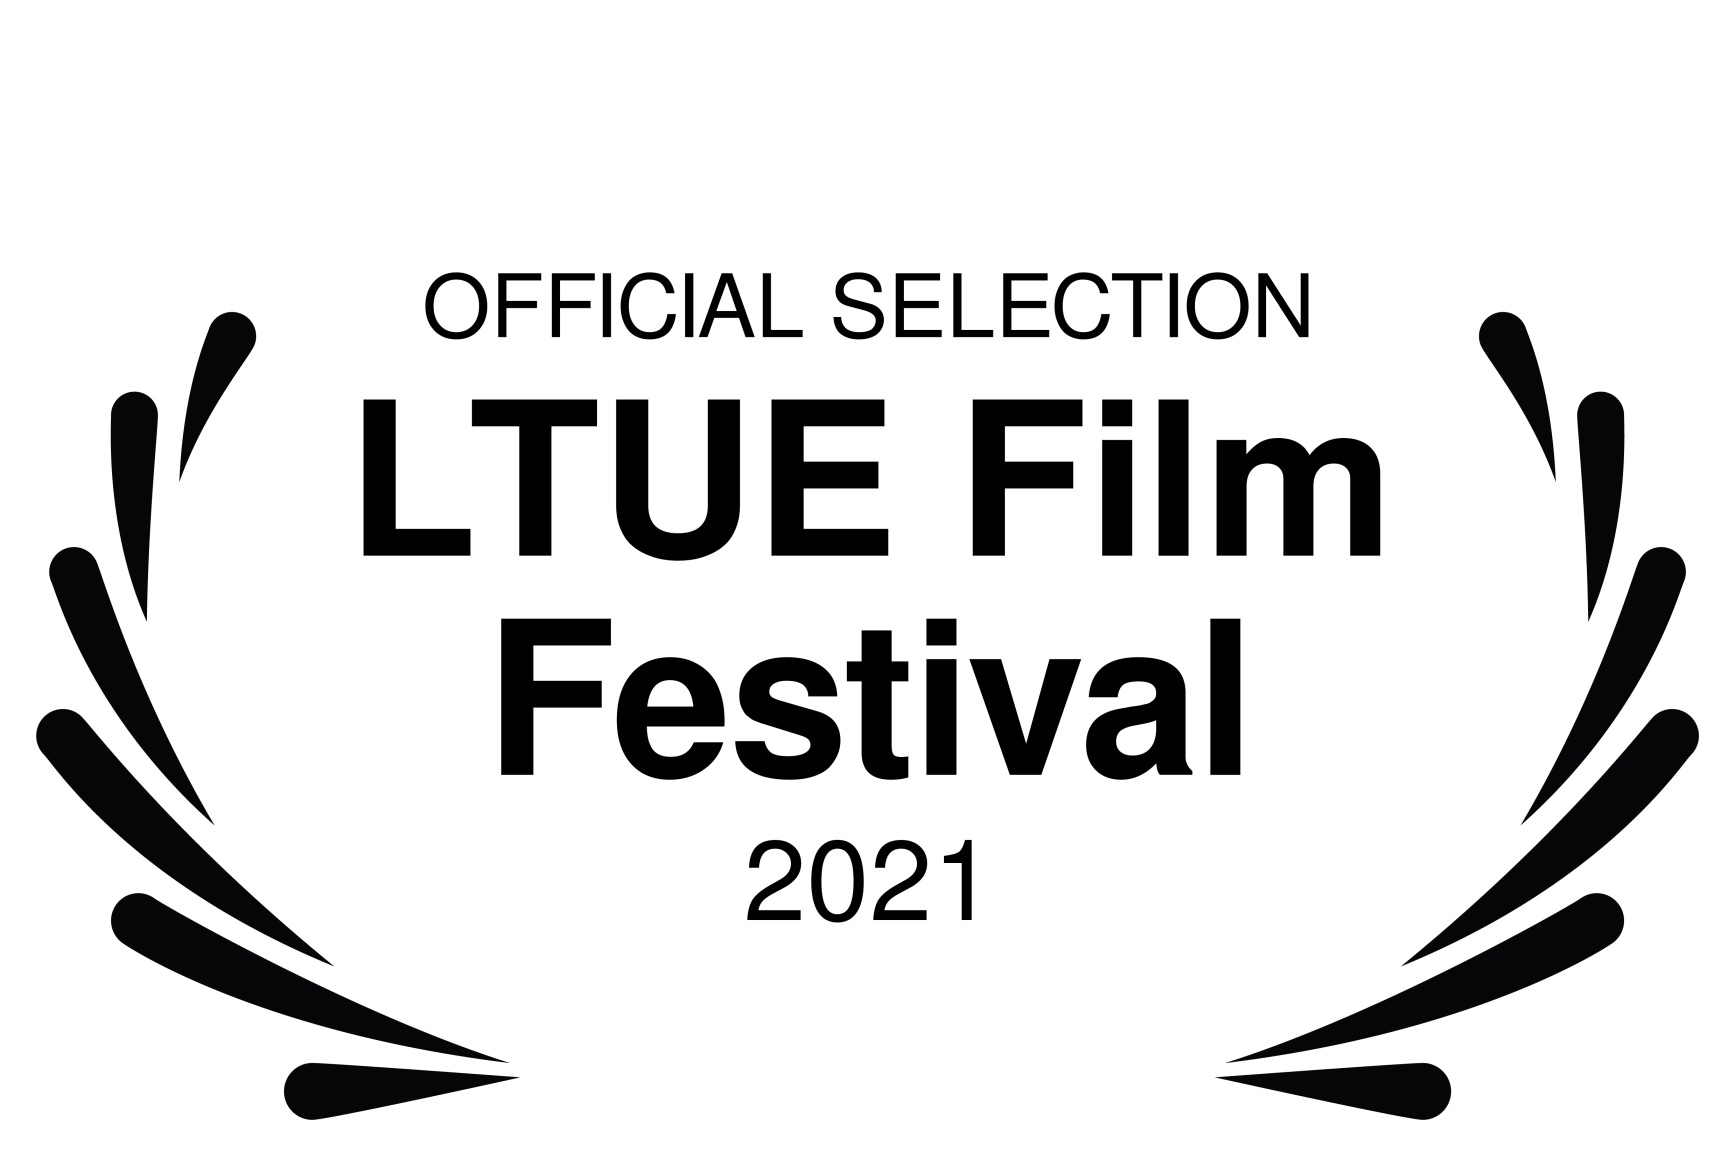 OFFICIAL SELECTION - LTUE Film Festival - 2021-2